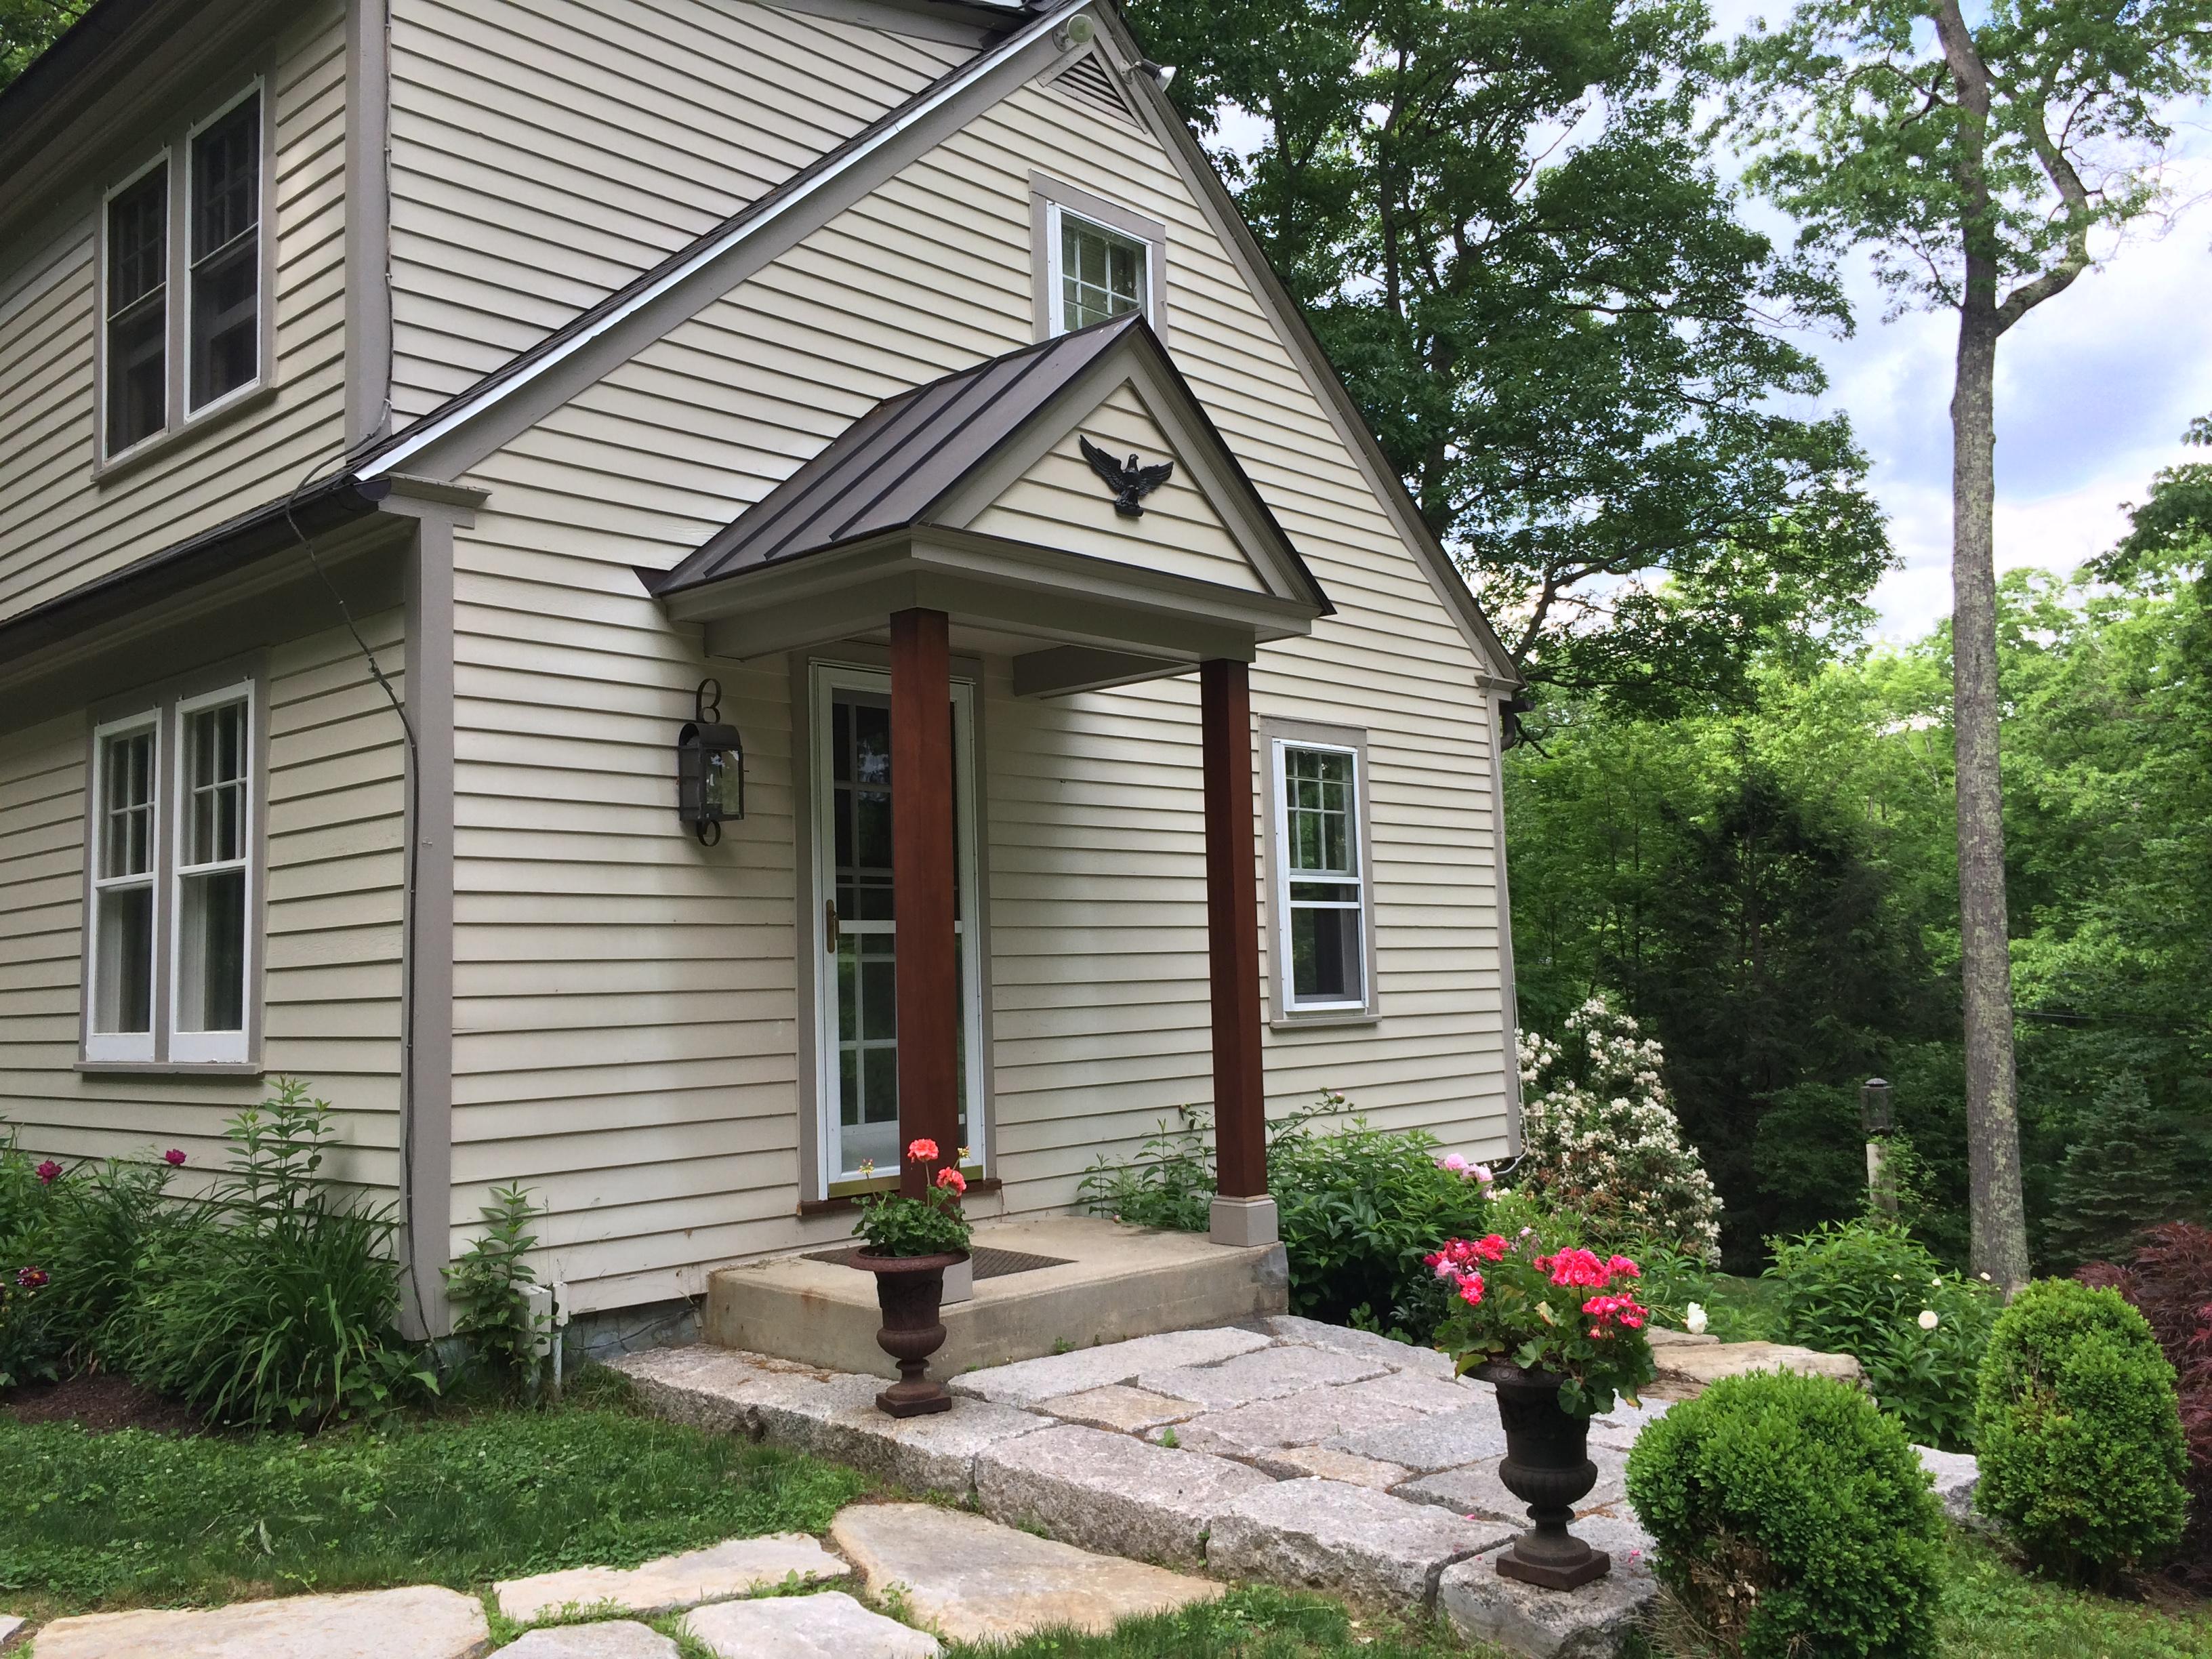 Casa Unifamiliar por un Venta en Charming Cottage with Access to Lake Waramaug 194 Woodville Rd Warren, Connecticut, 06777 Estados Unidos